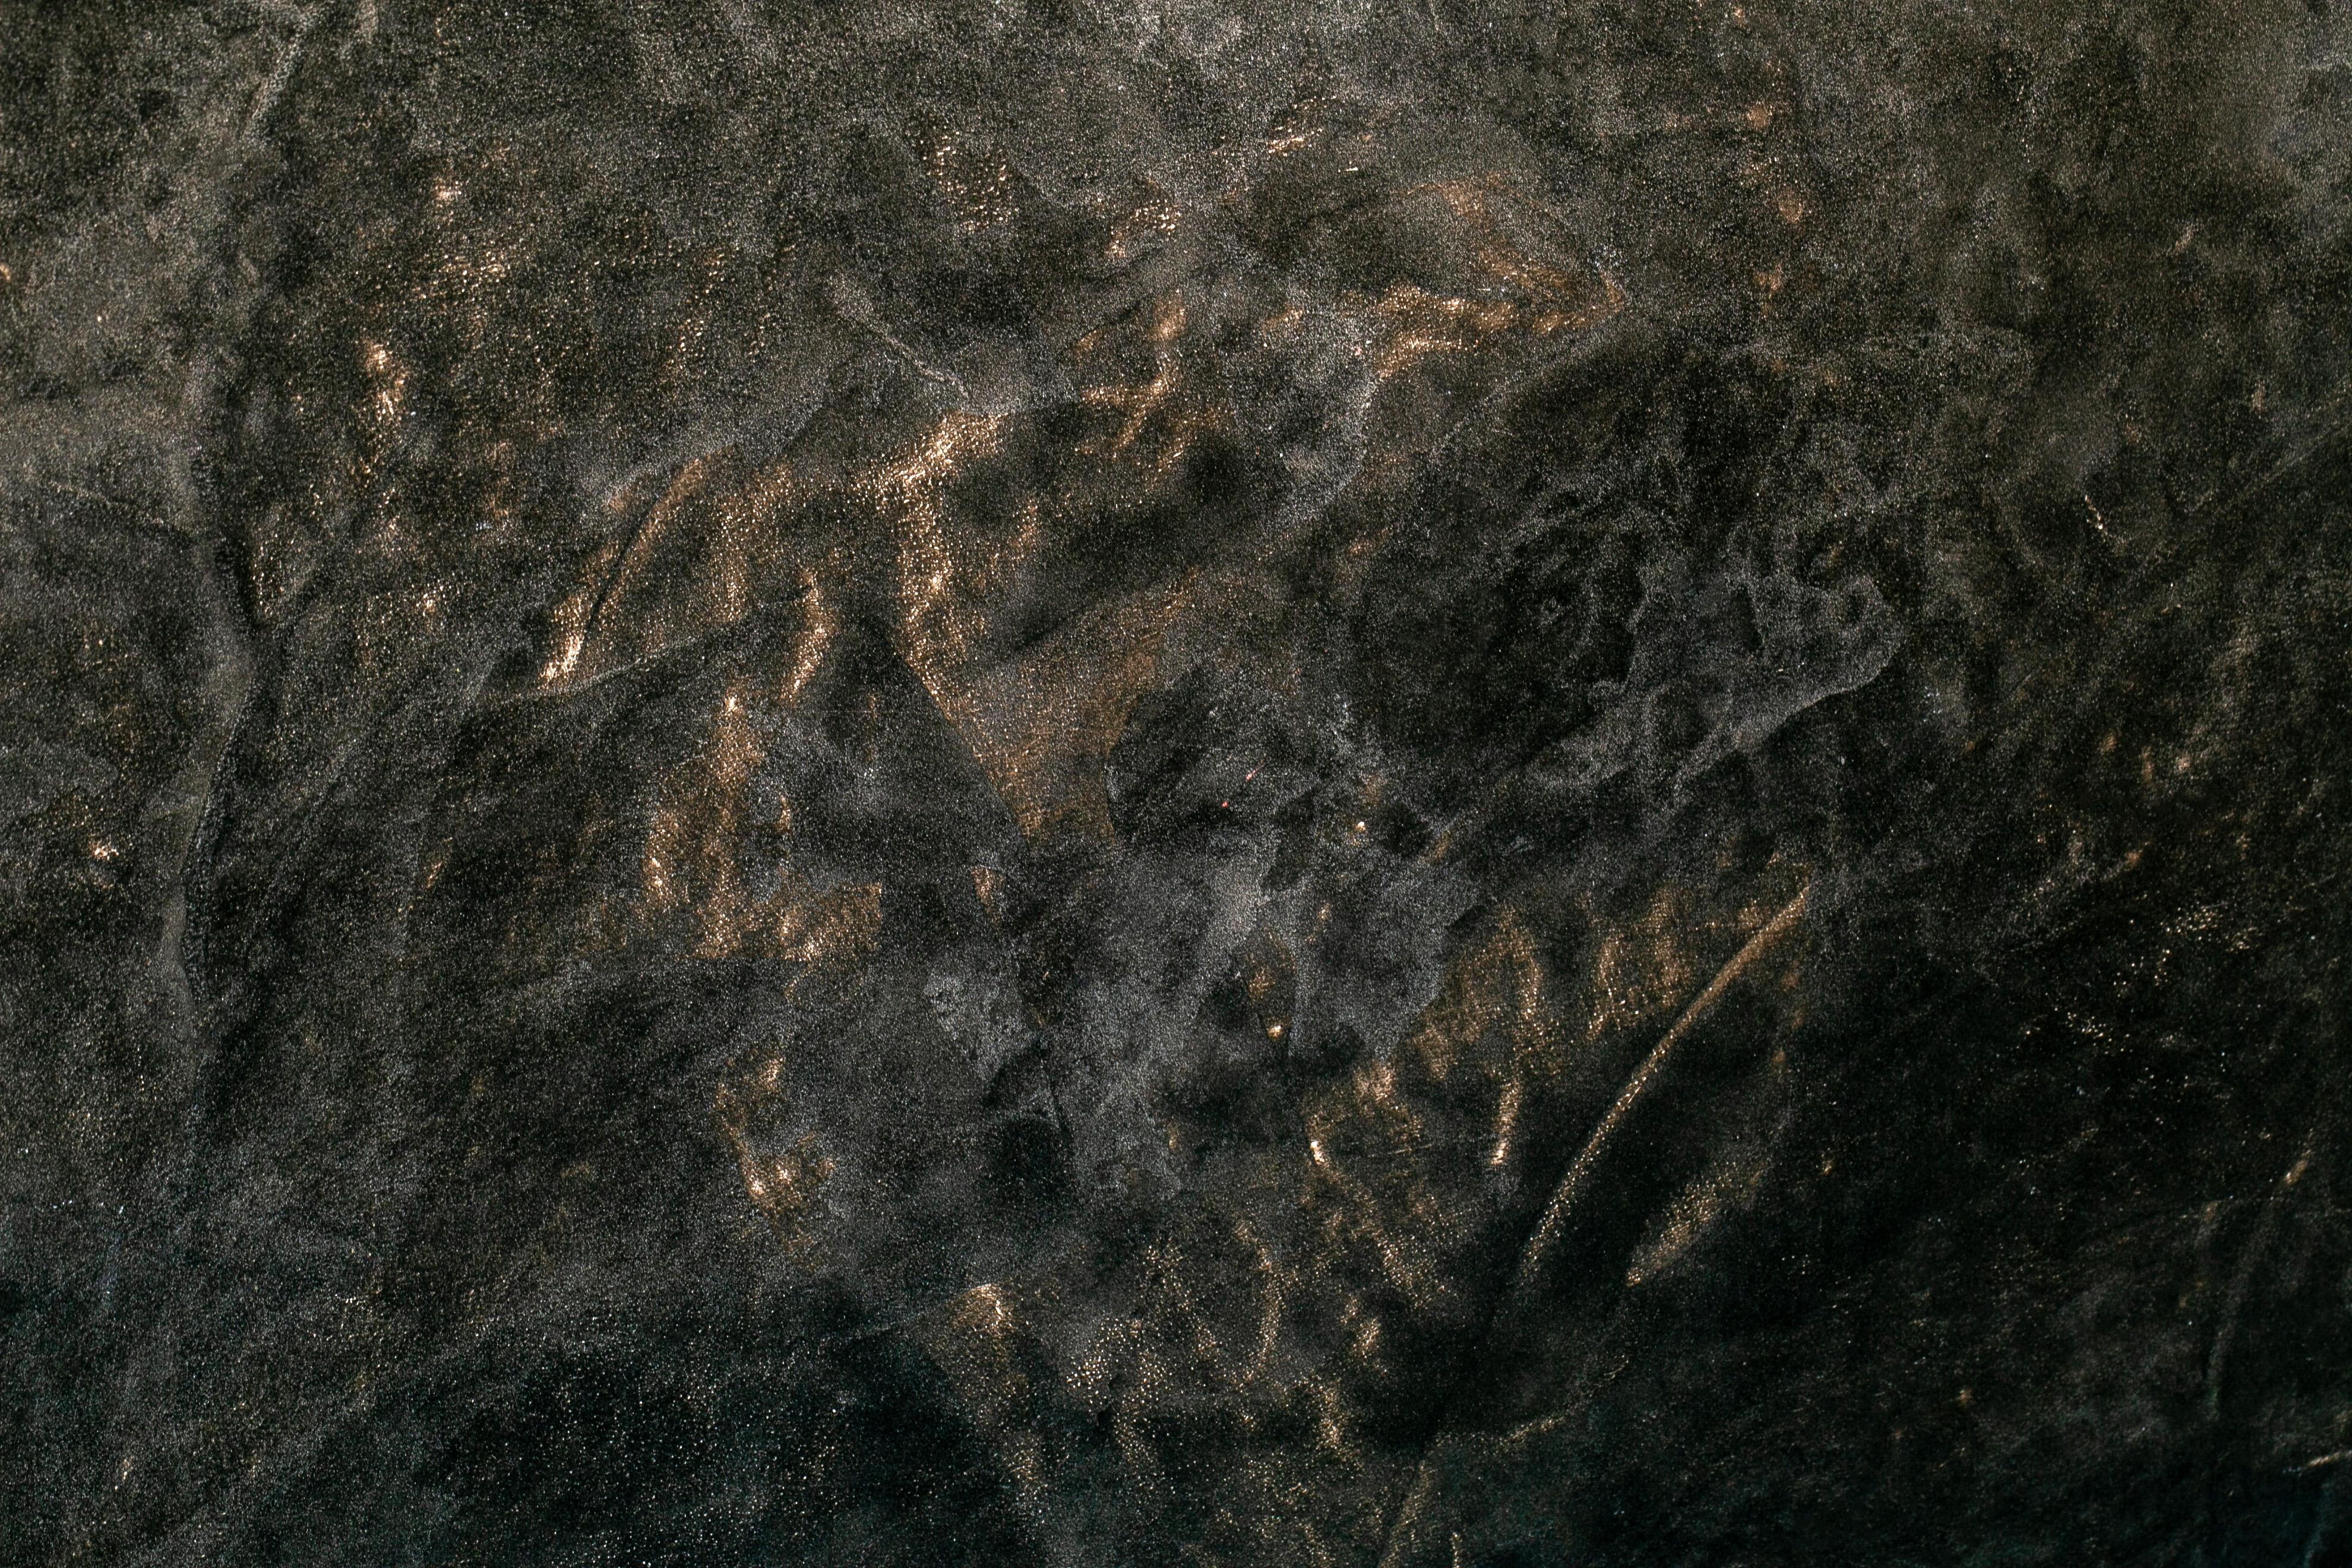 Galaxy BW-1901